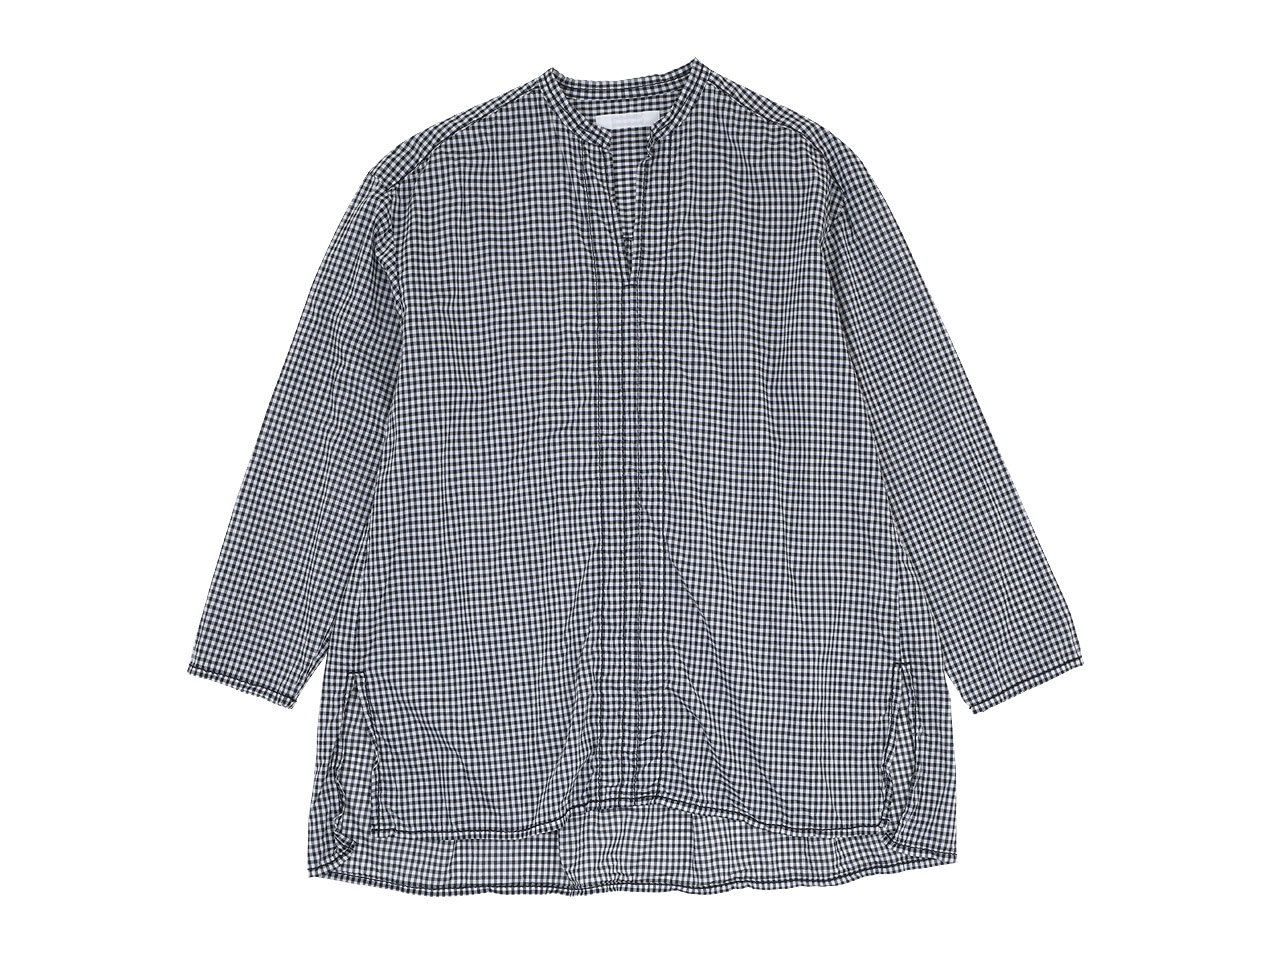 homspun 80/1ギンガム スタンドカラー プルオーバーシャツ ブラック